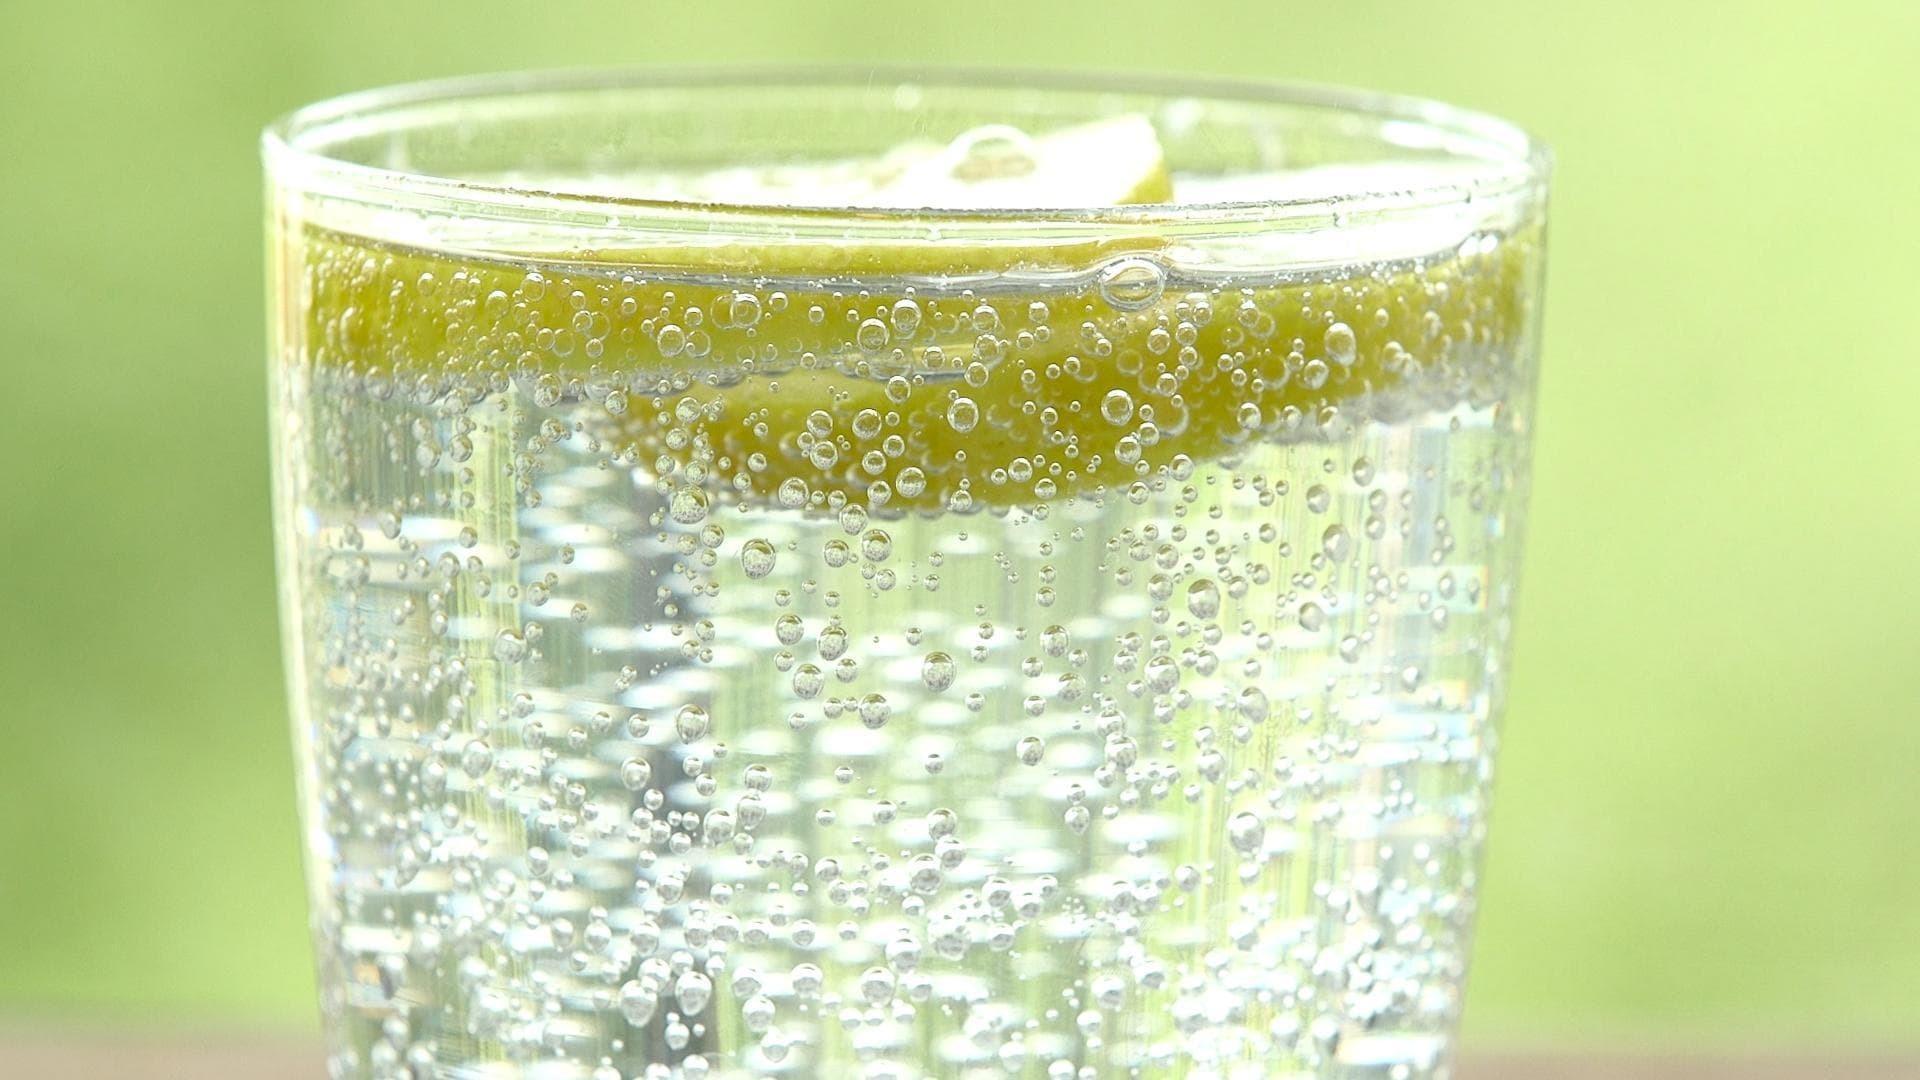 Пузырьки лучше утоляют жажду